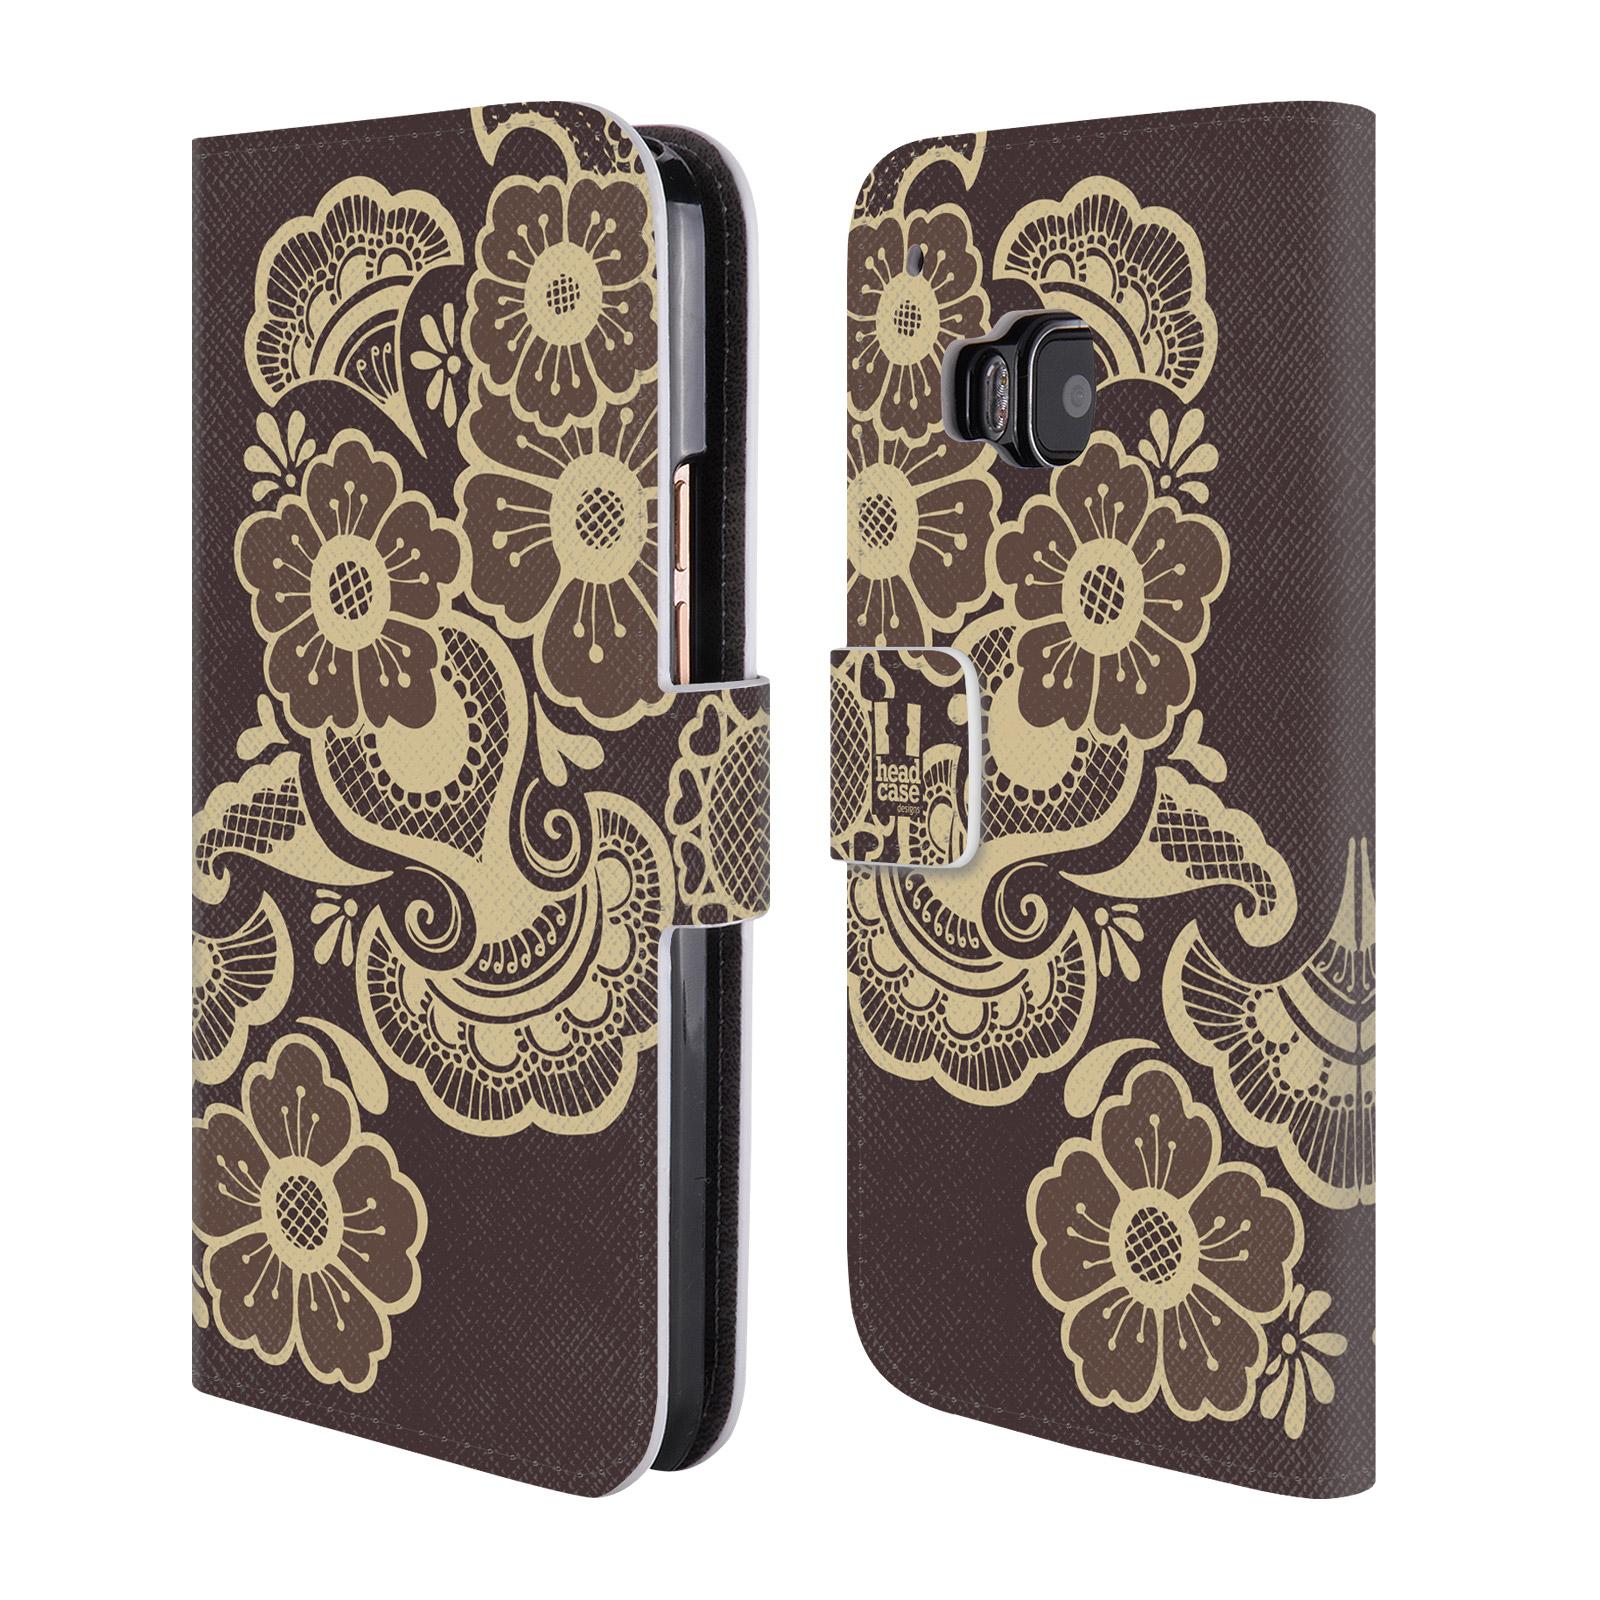 head case henna brieftasche handyh lle aus leder f r htc. Black Bedroom Furniture Sets. Home Design Ideas